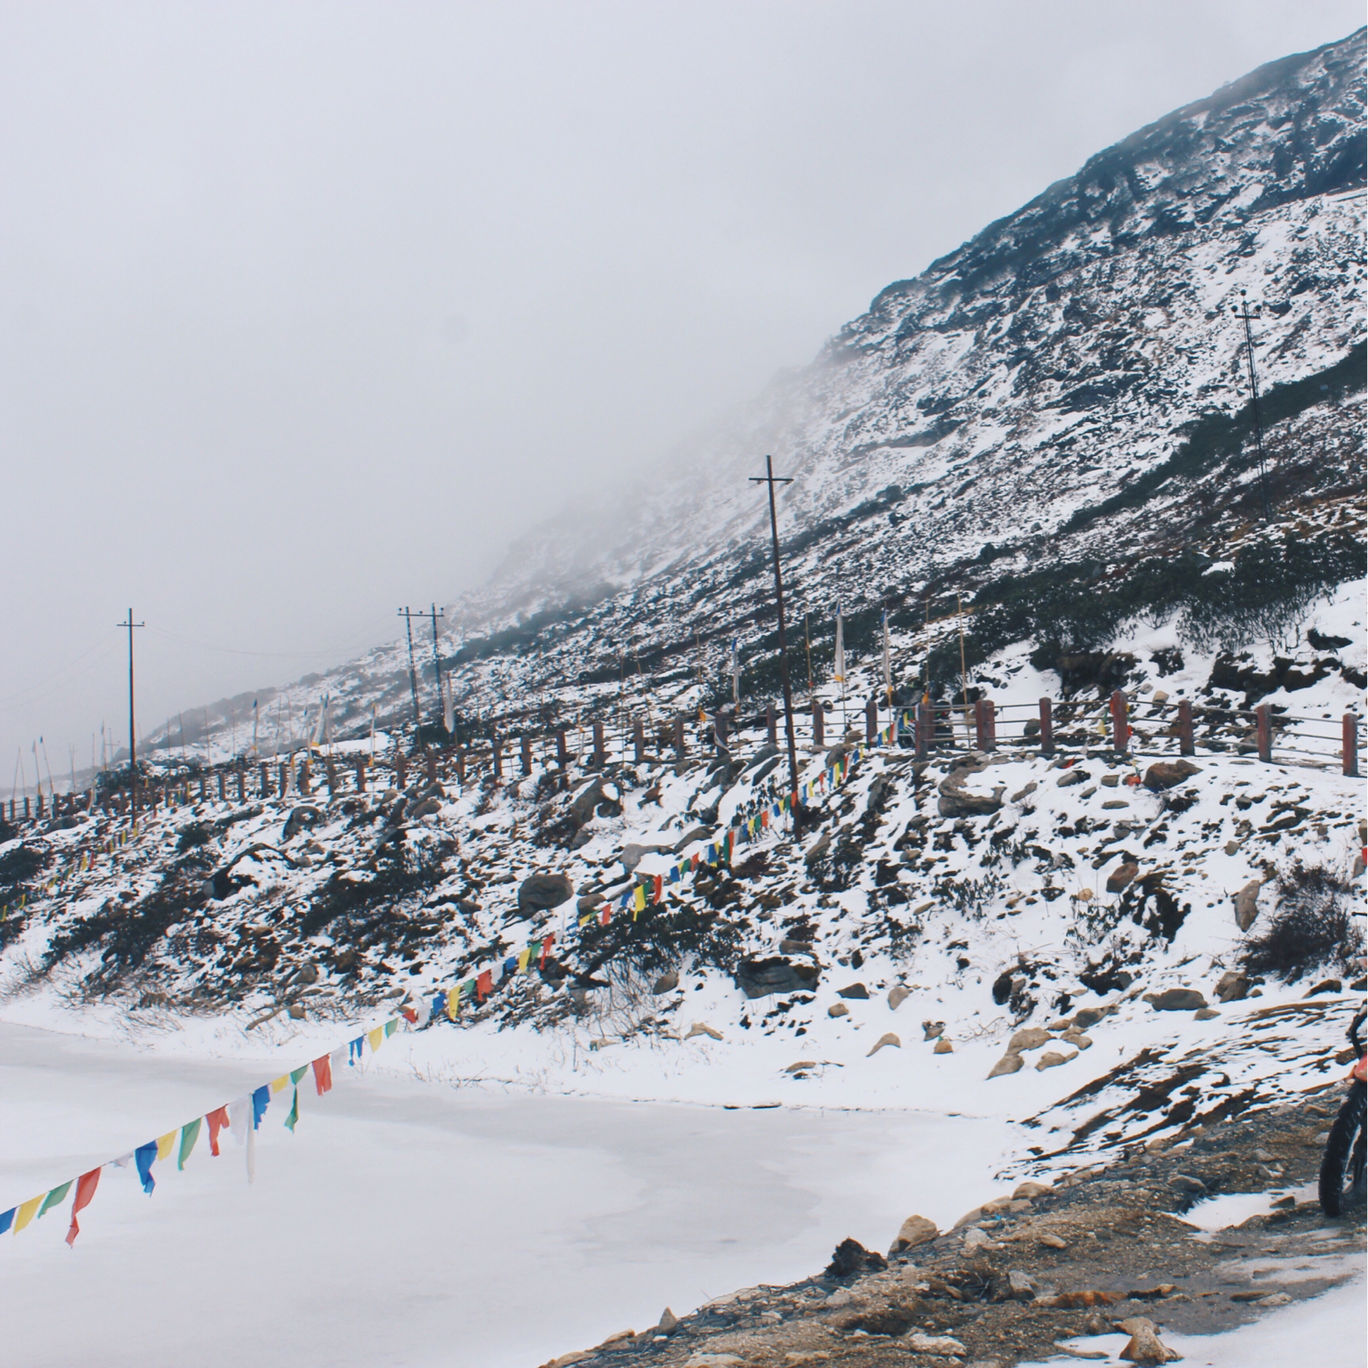 Photo of Bum La Pass By Gokul Saikia